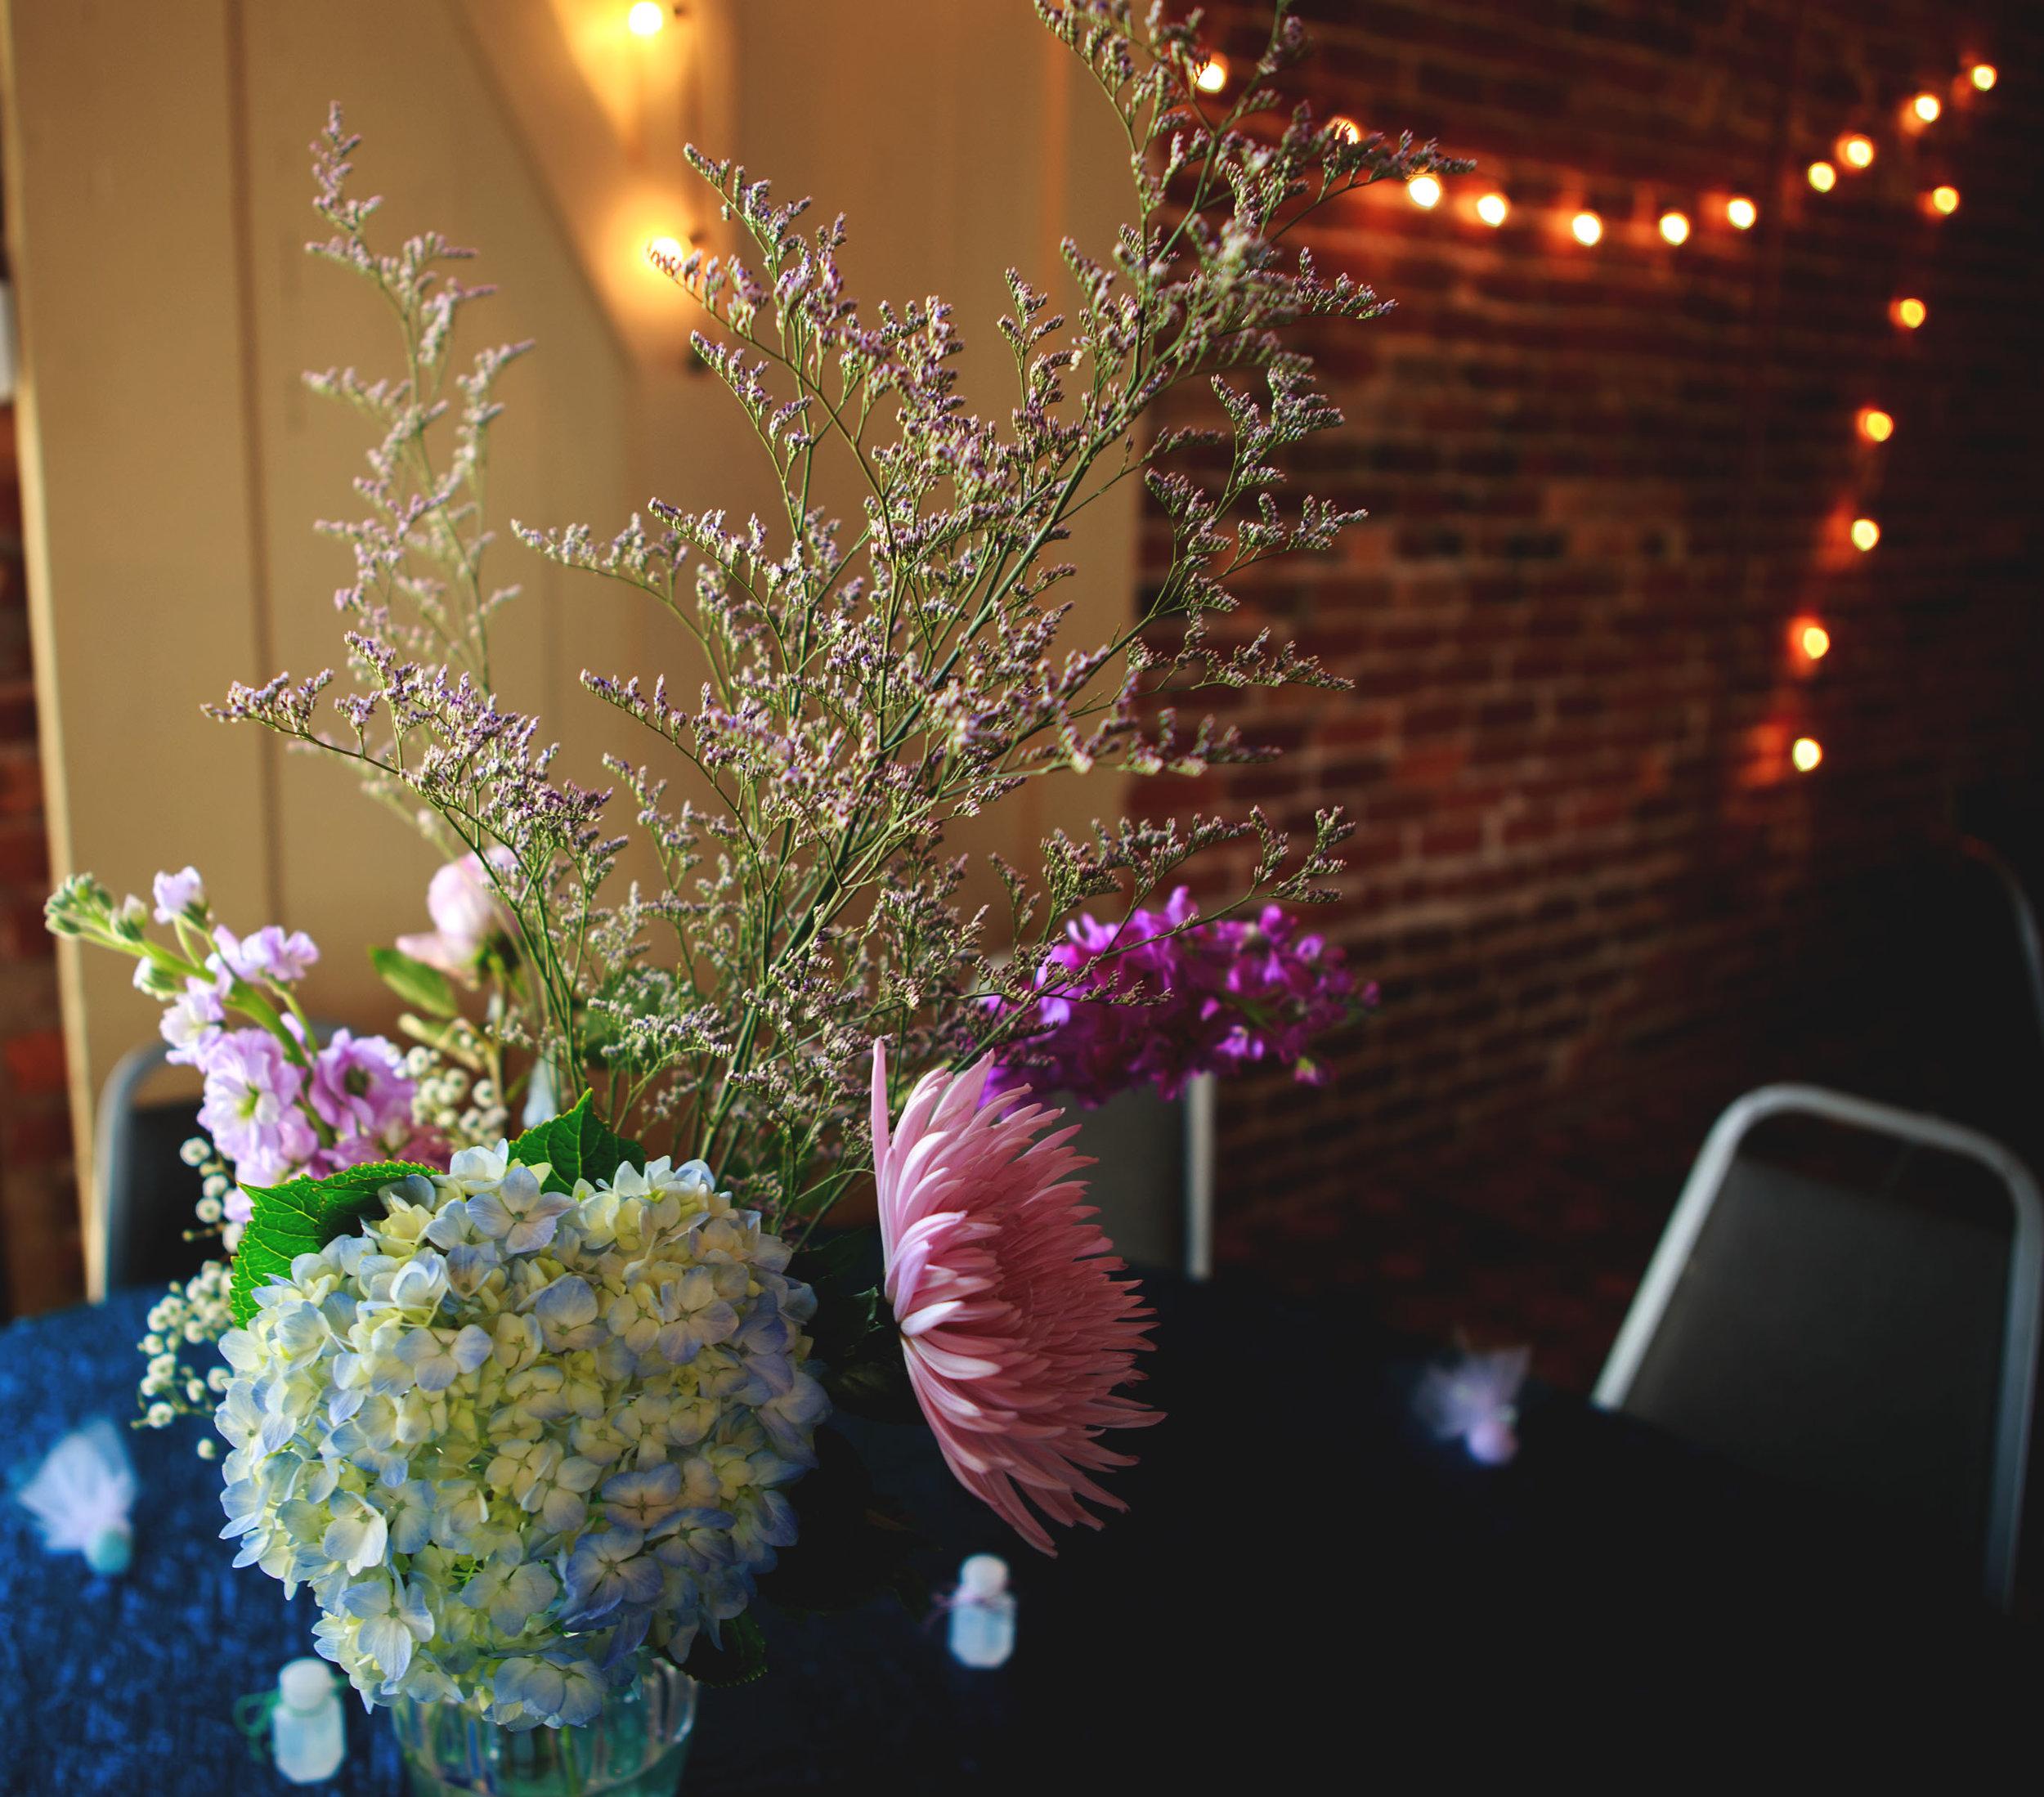 North_Carolina_Wedding_Photographer_Tiffany_Abruzzo_Reception_5.jpg